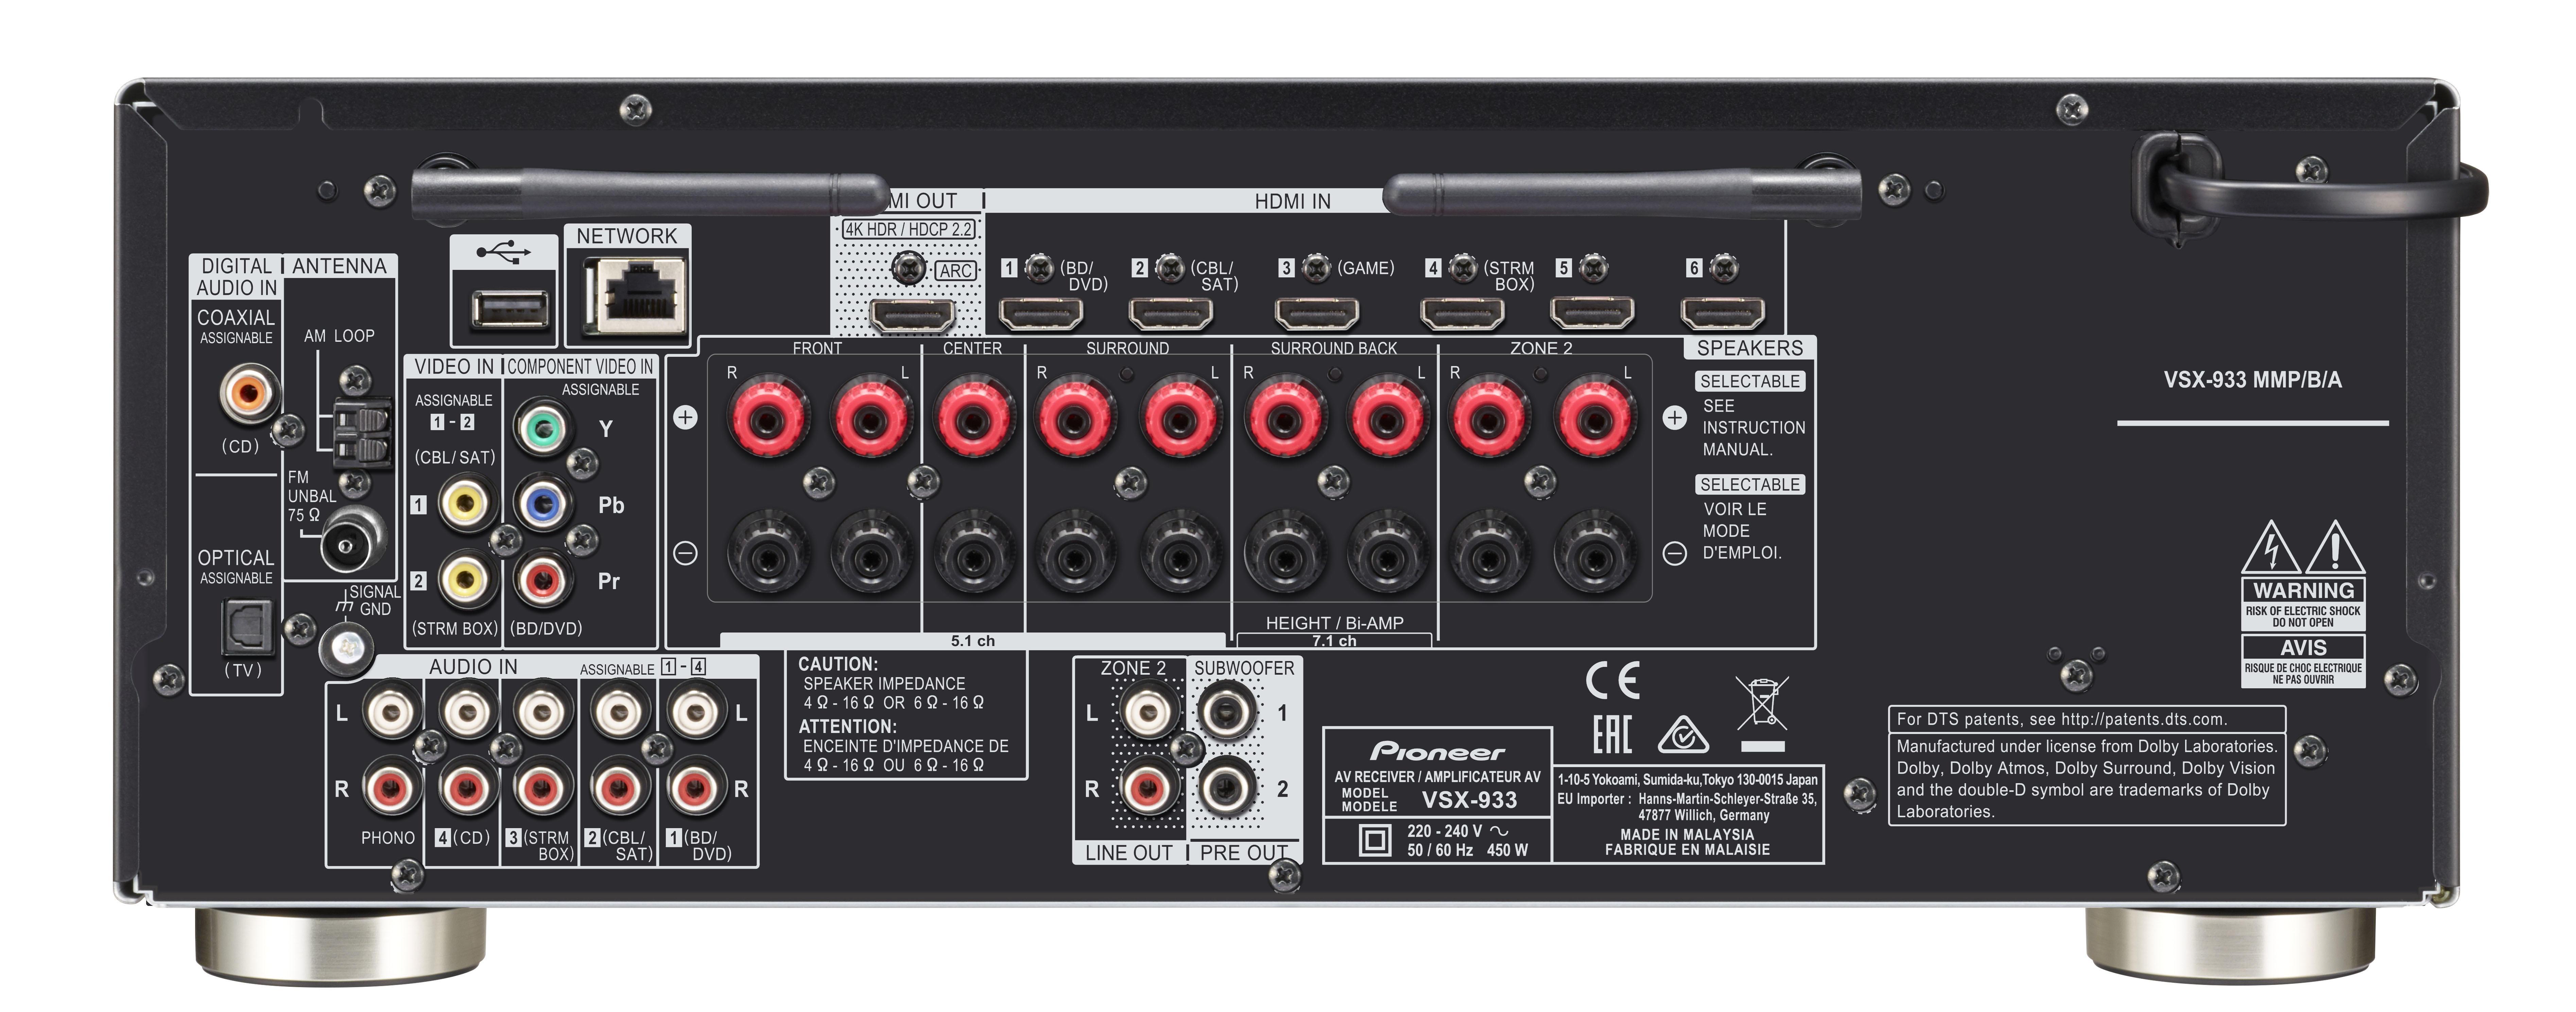 Vsx 933 Av Receivers Products Pioneer Home Audio Visual